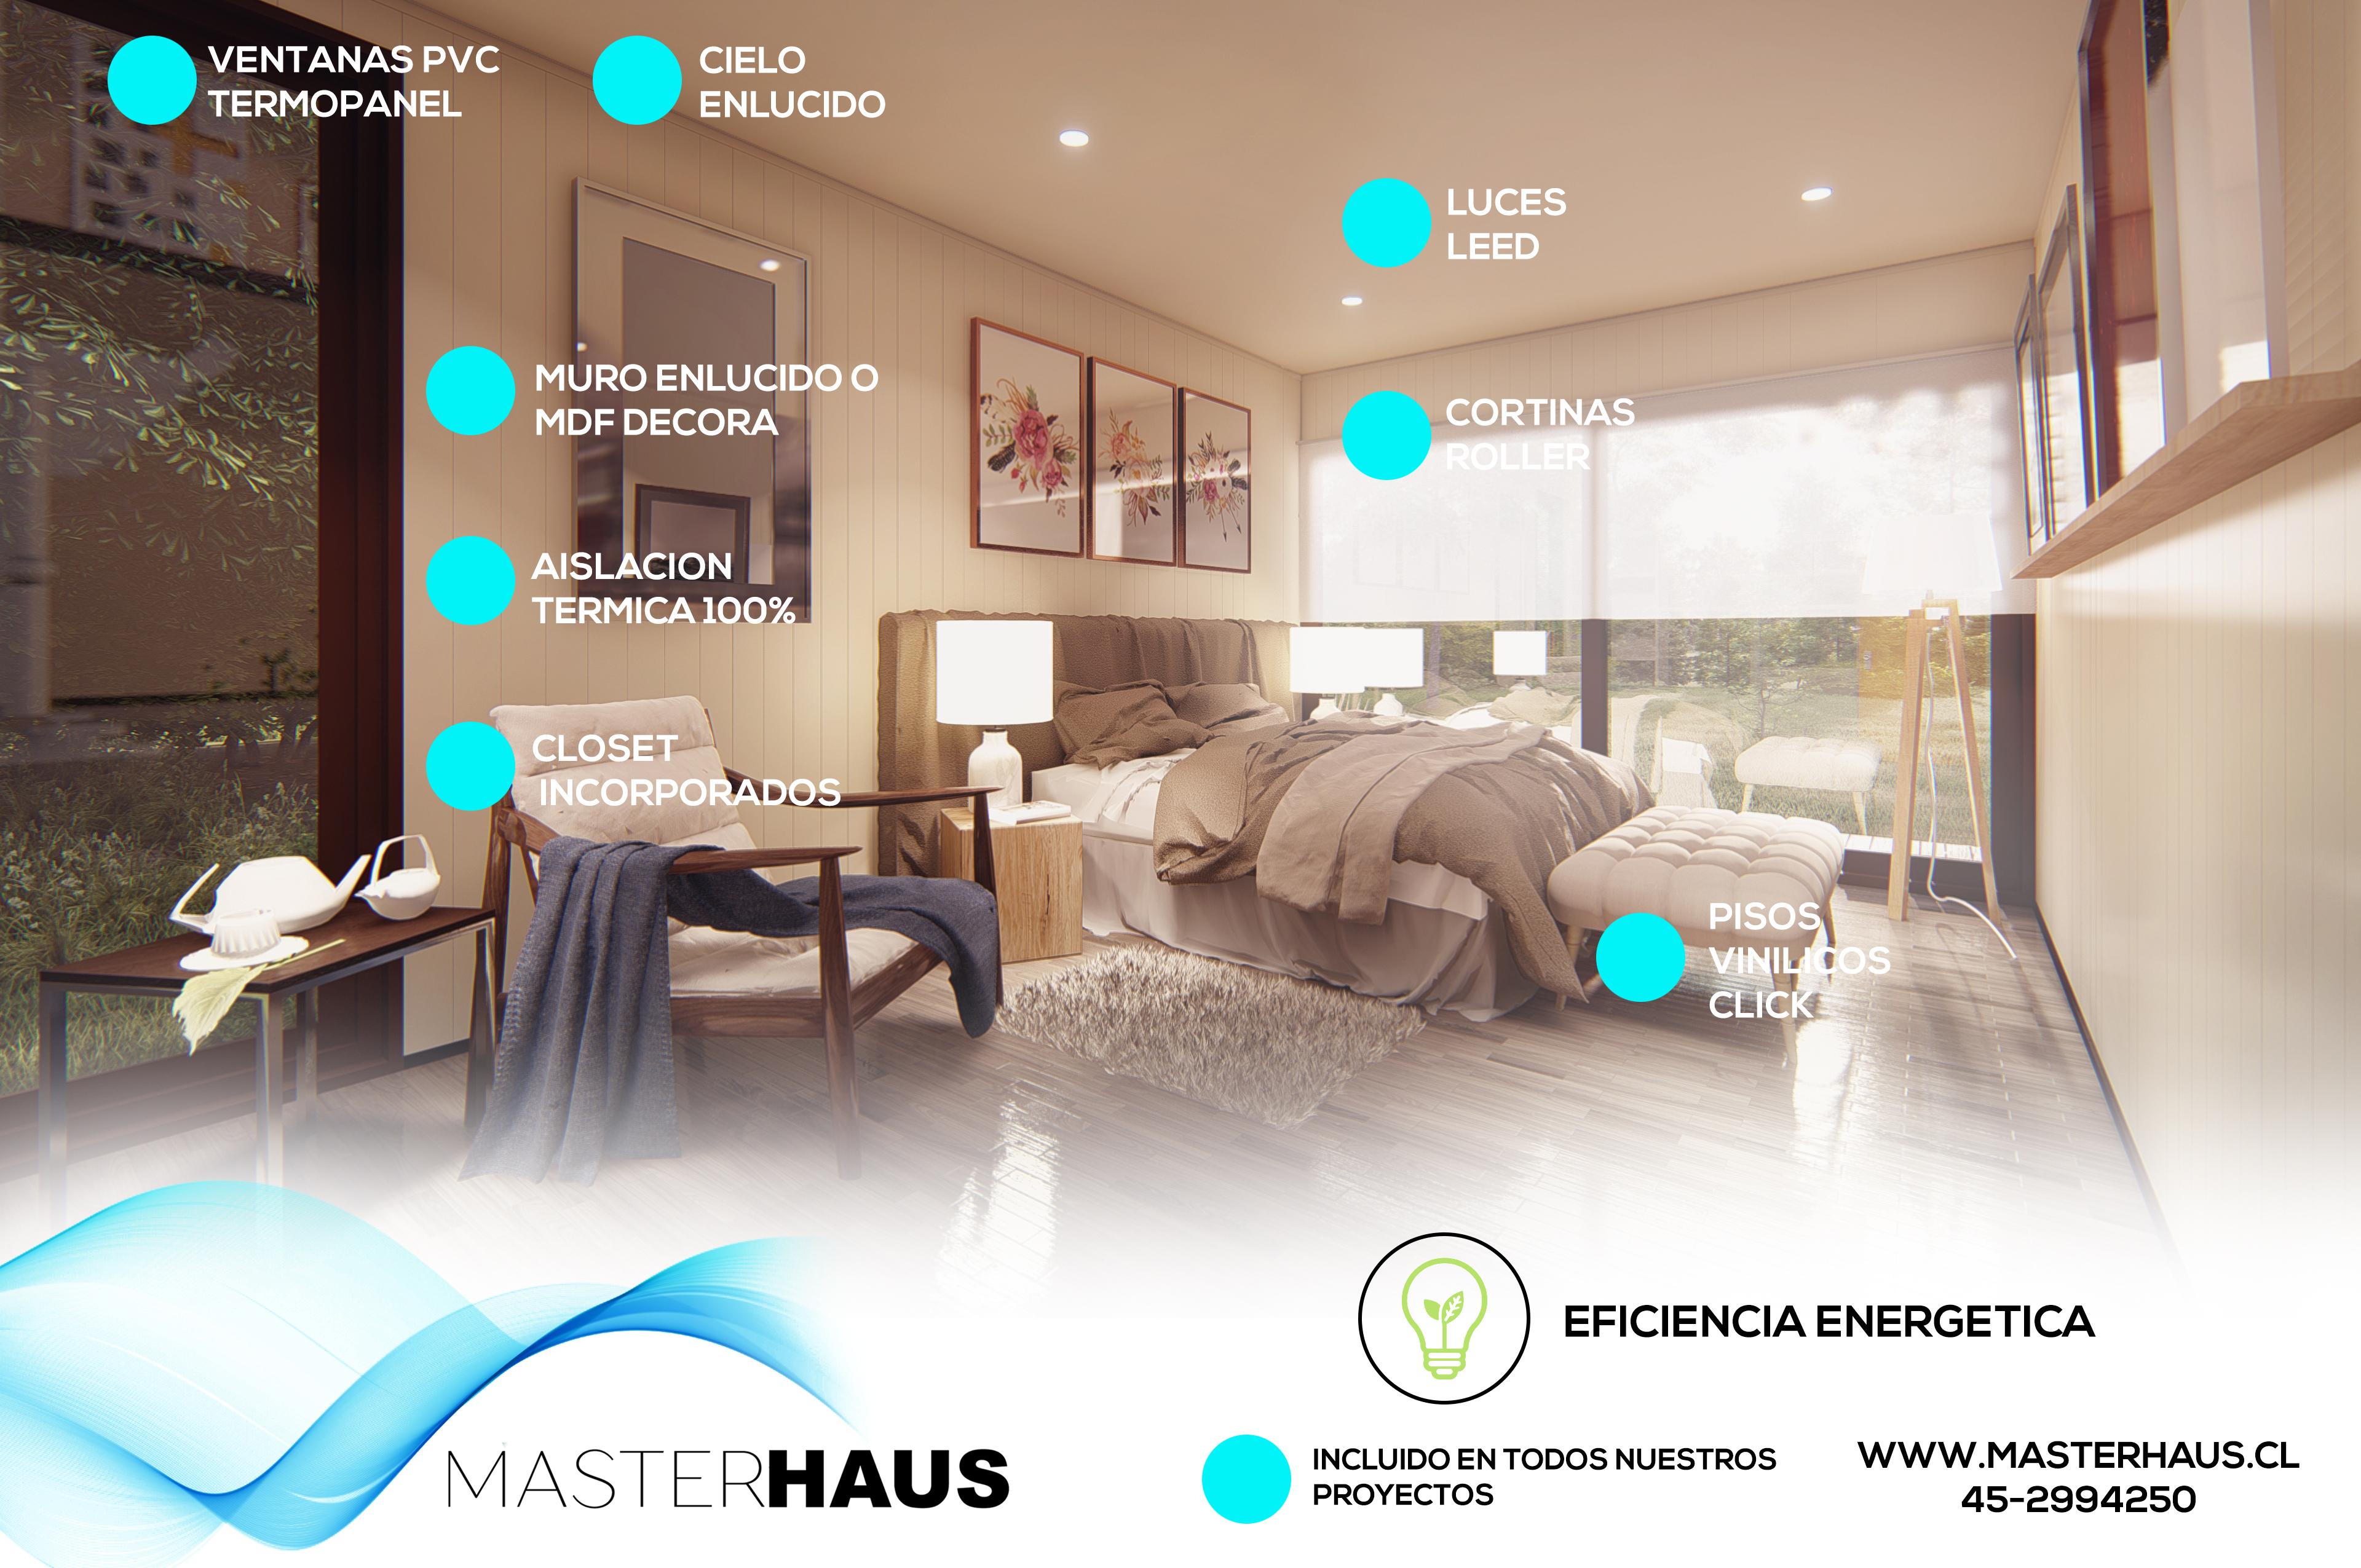 MasterHaus/IEA Tipo